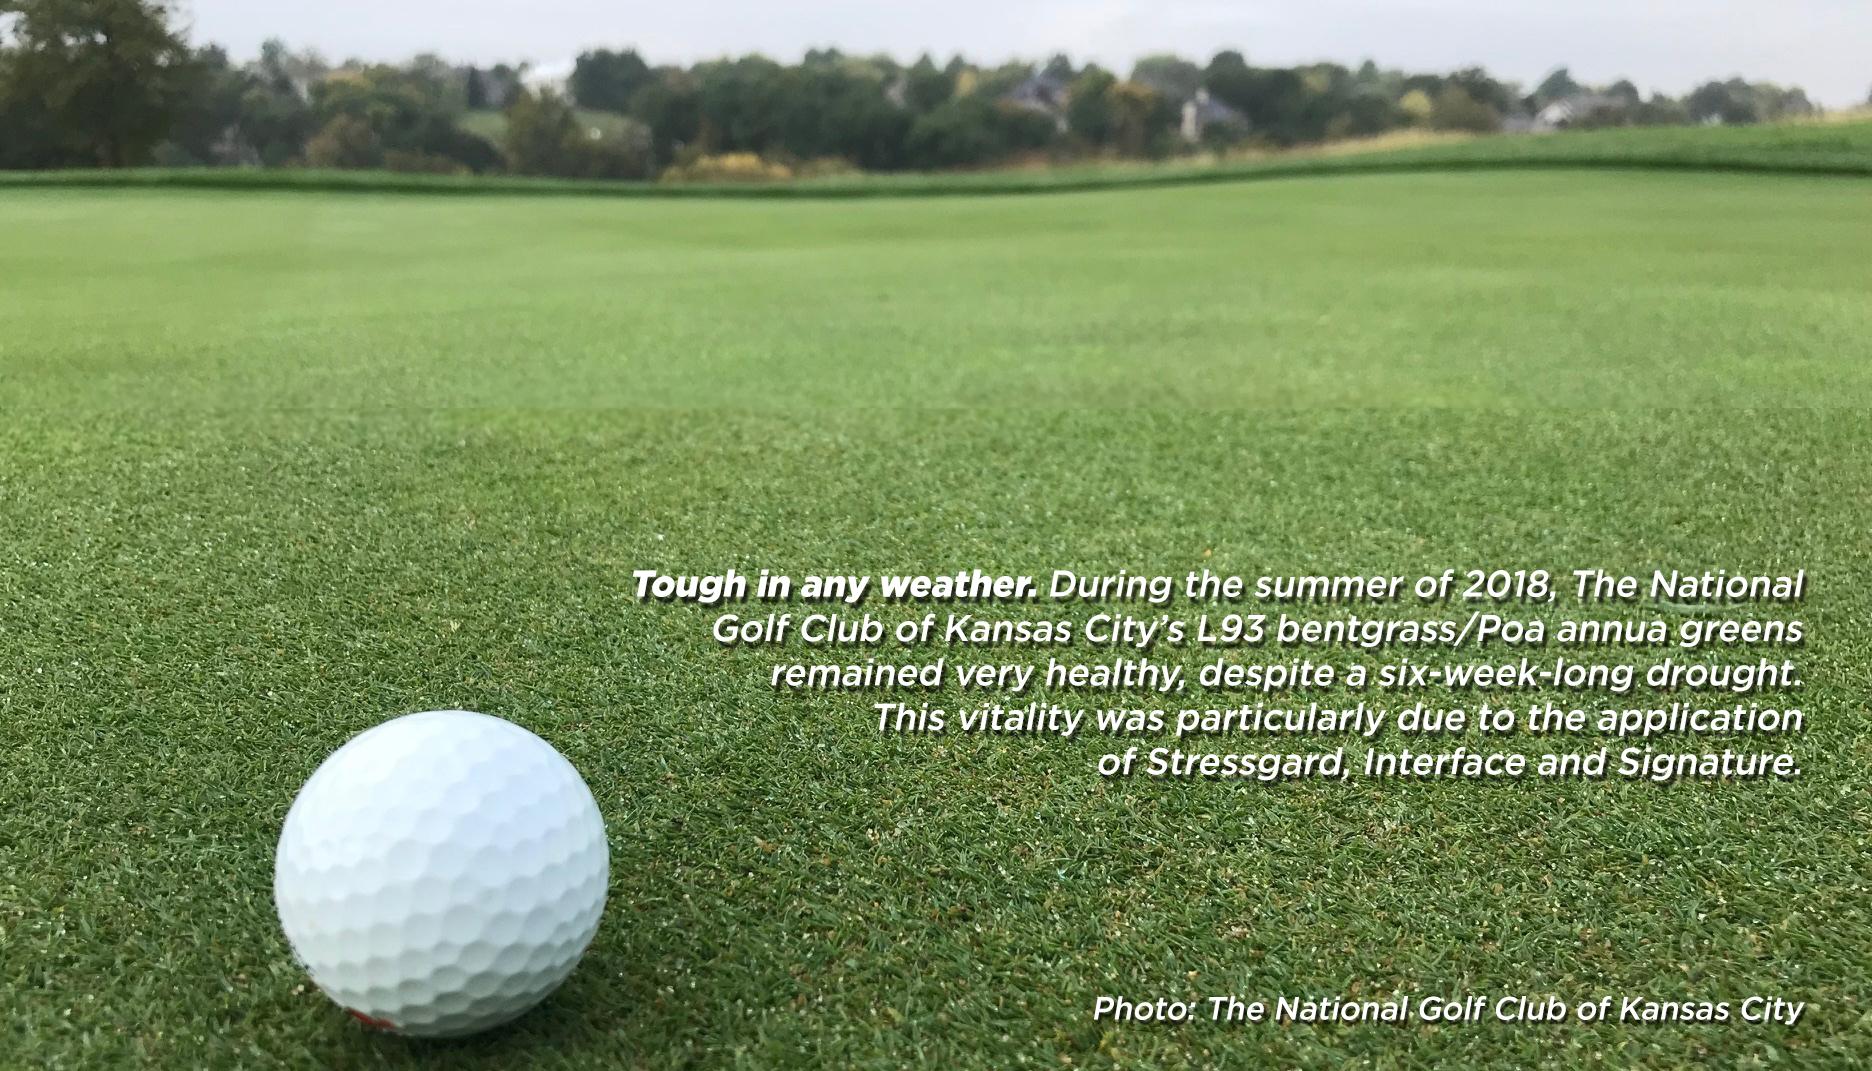 Photo: The National Golf Club of Kansas City